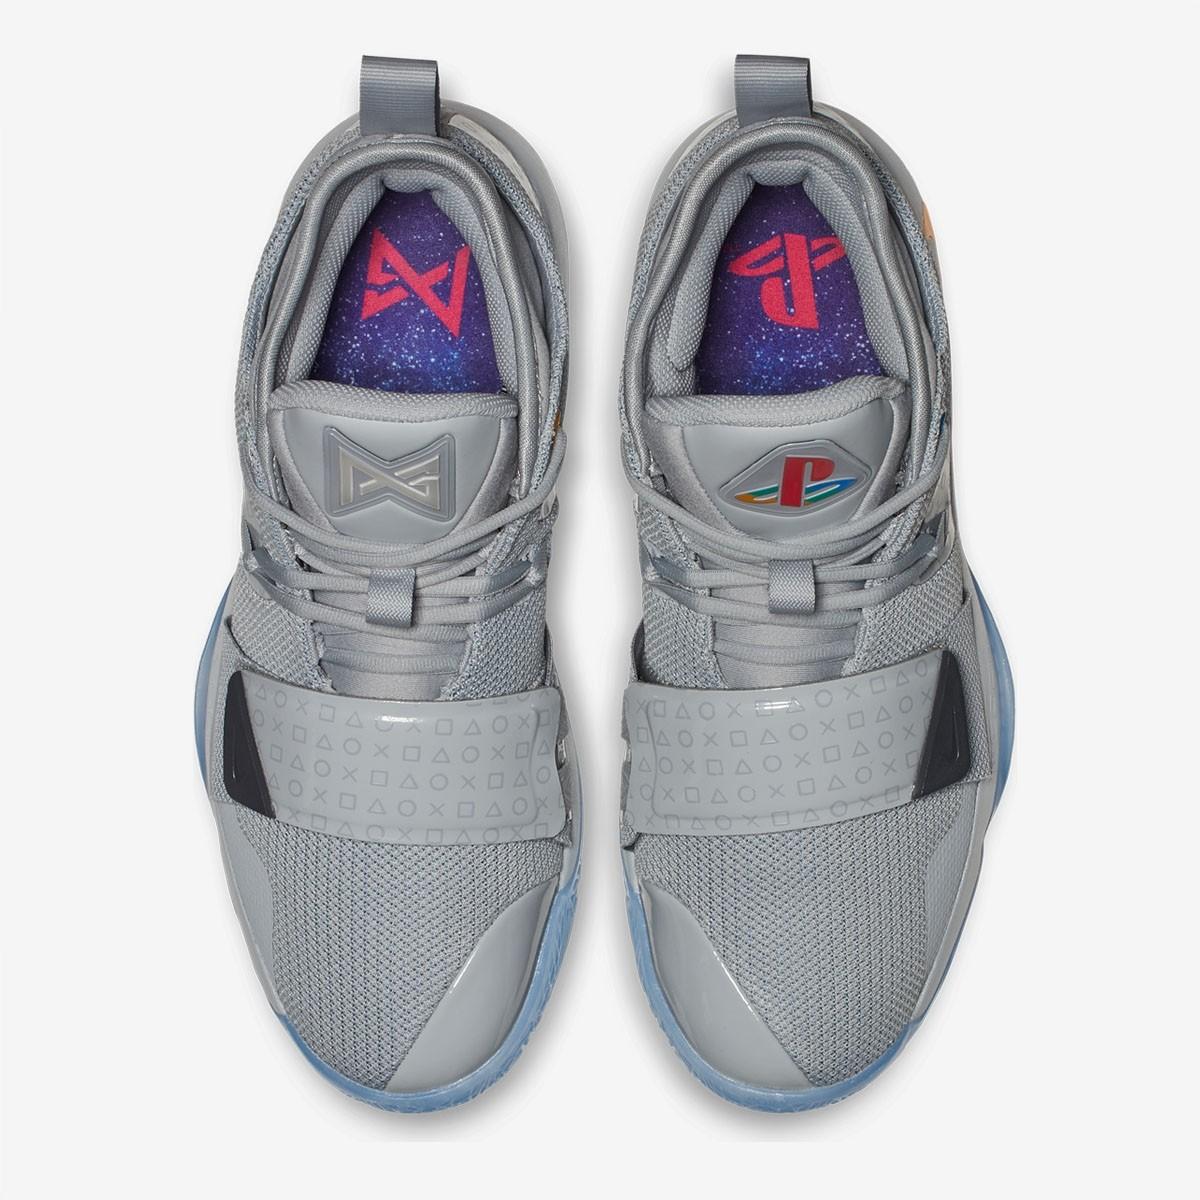 Nike PG 2.5 Play Station 'Grey' BQ8388-001